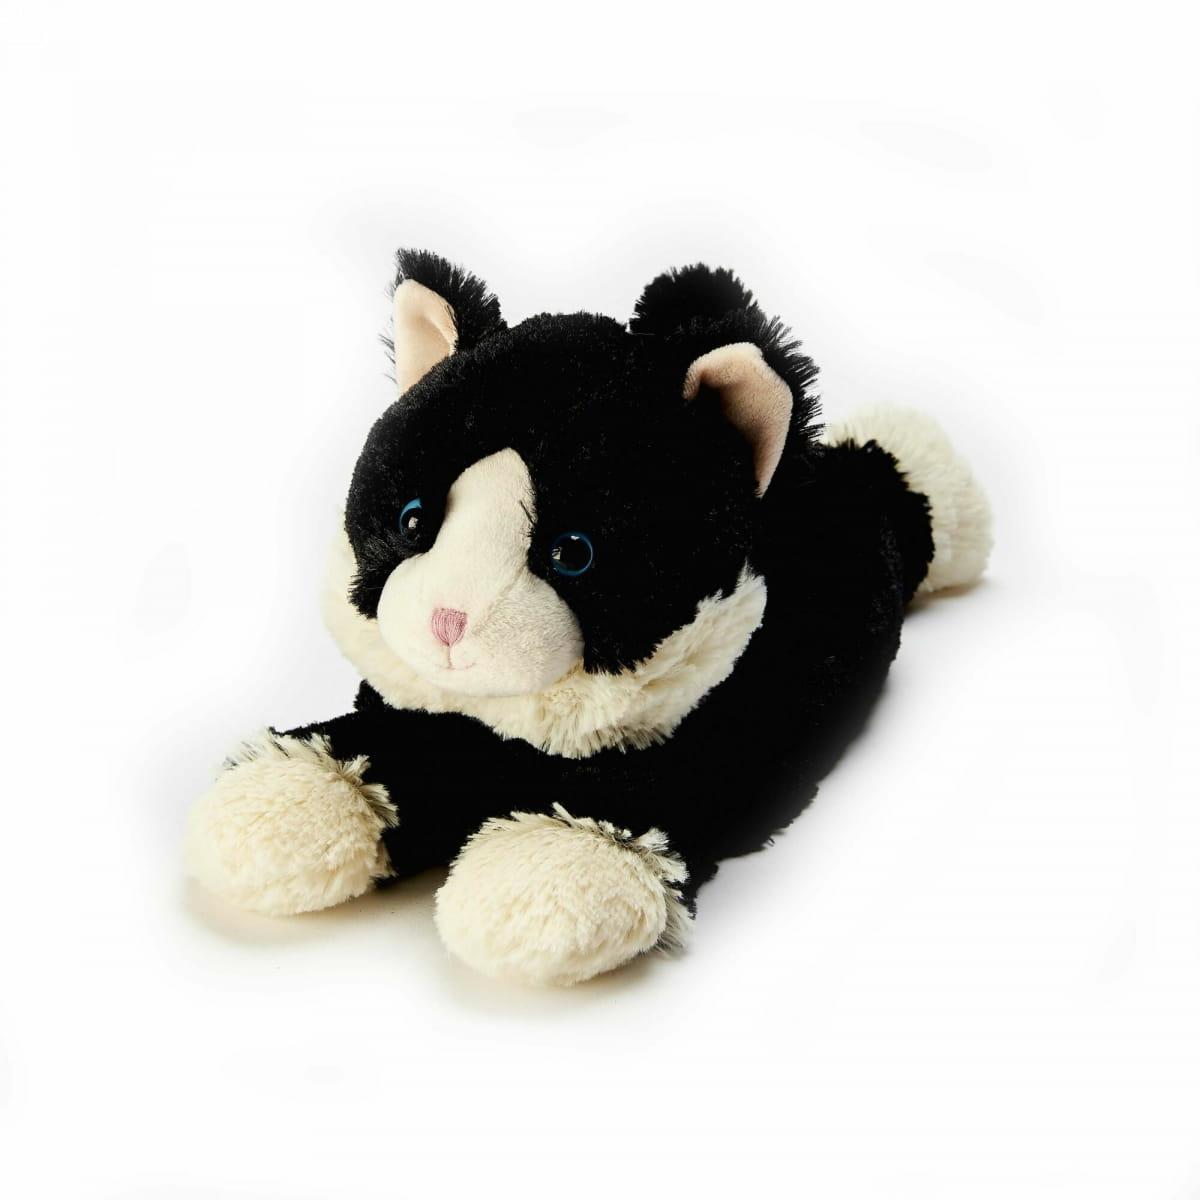 Игрушка грелка WARMIES Cozy Plush Черная Киса - Игрушки-грелки